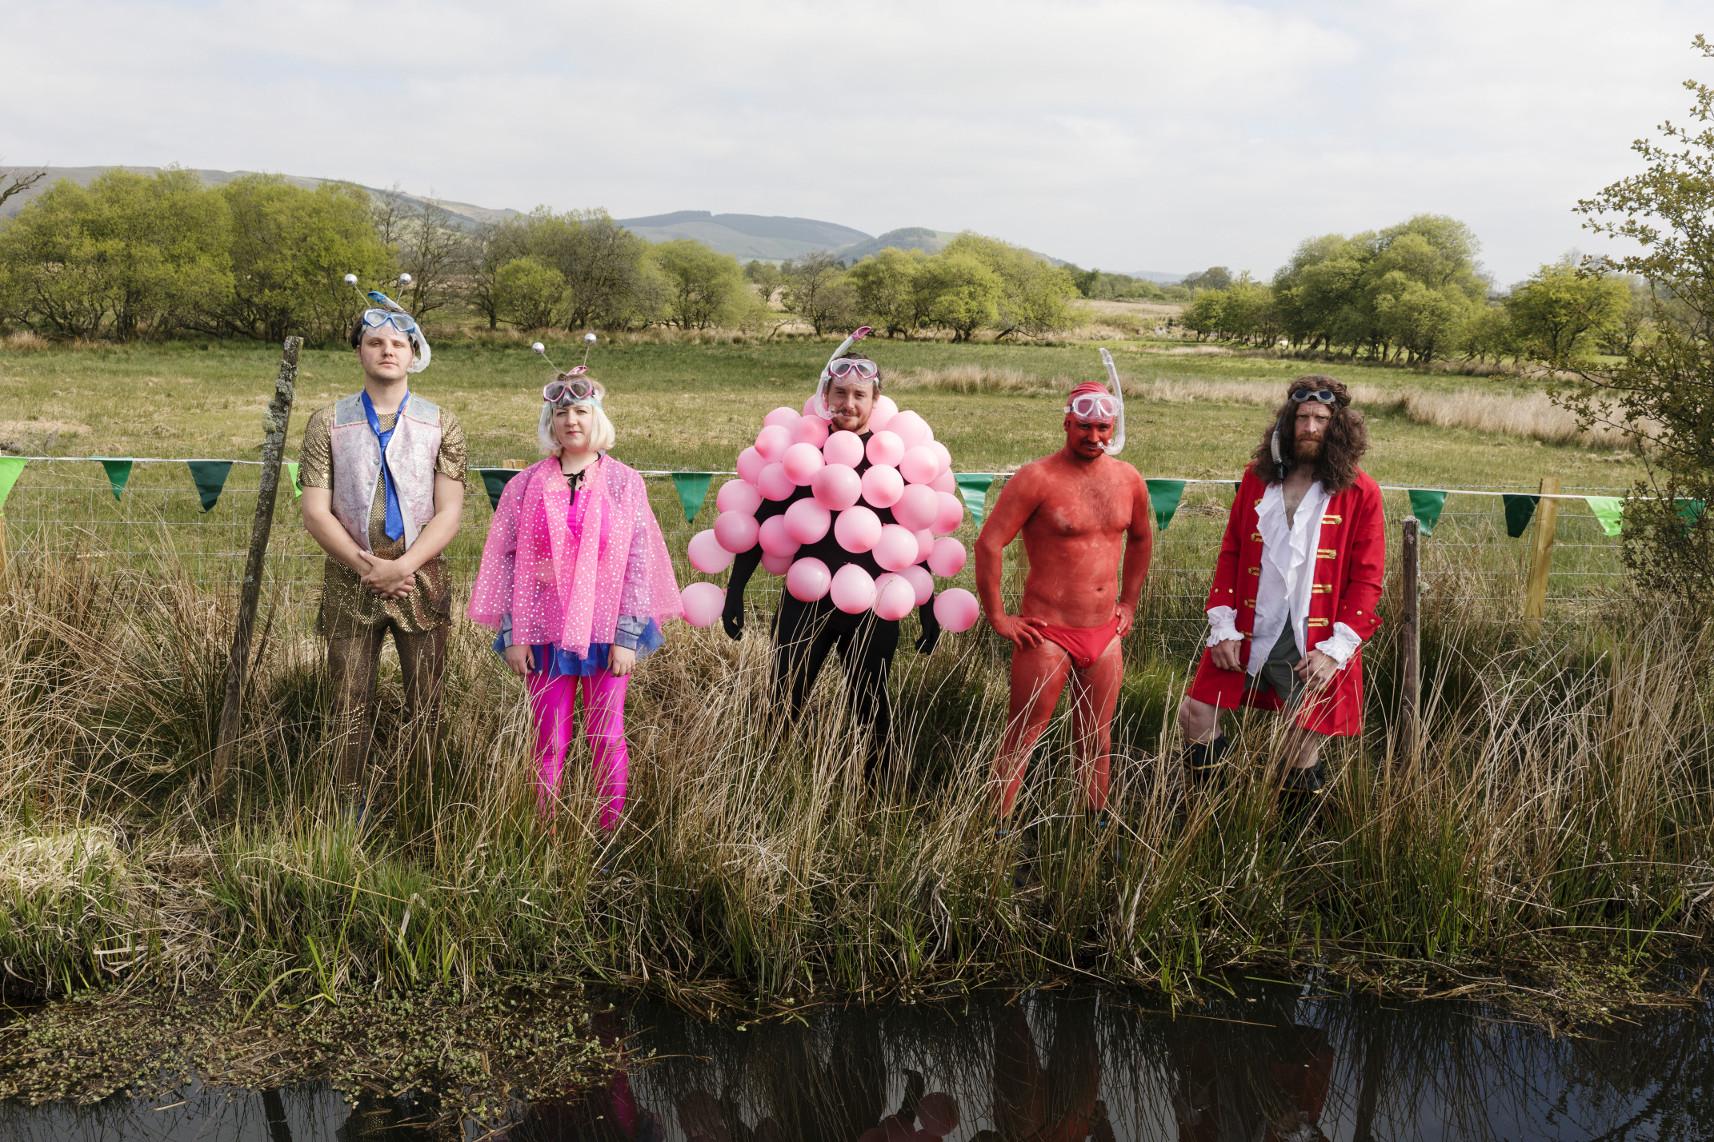 BBC Oneness, Bog Snorkling, Llanwrtyd Wells, Photographer: Martin Parr